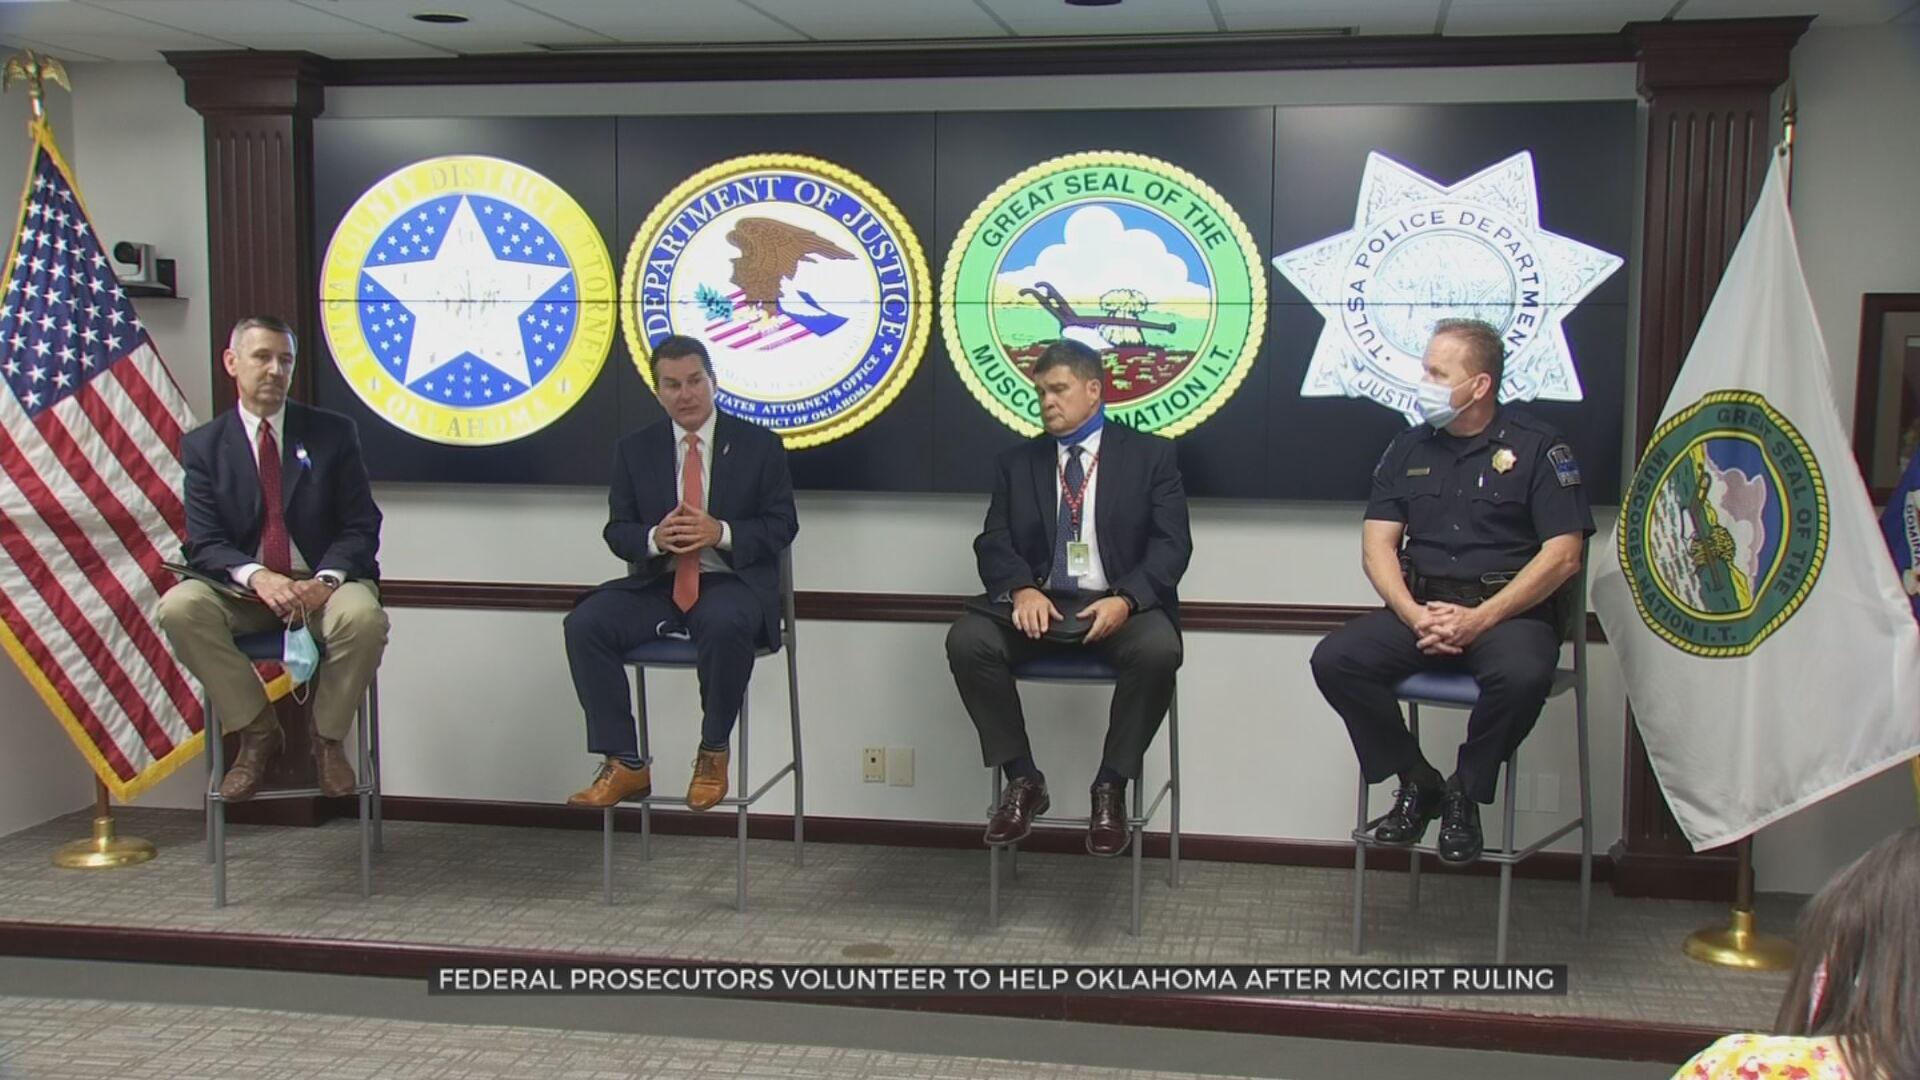 Federal Prosecutors Volunteer To Help Oklahoma After McGirt Ruling